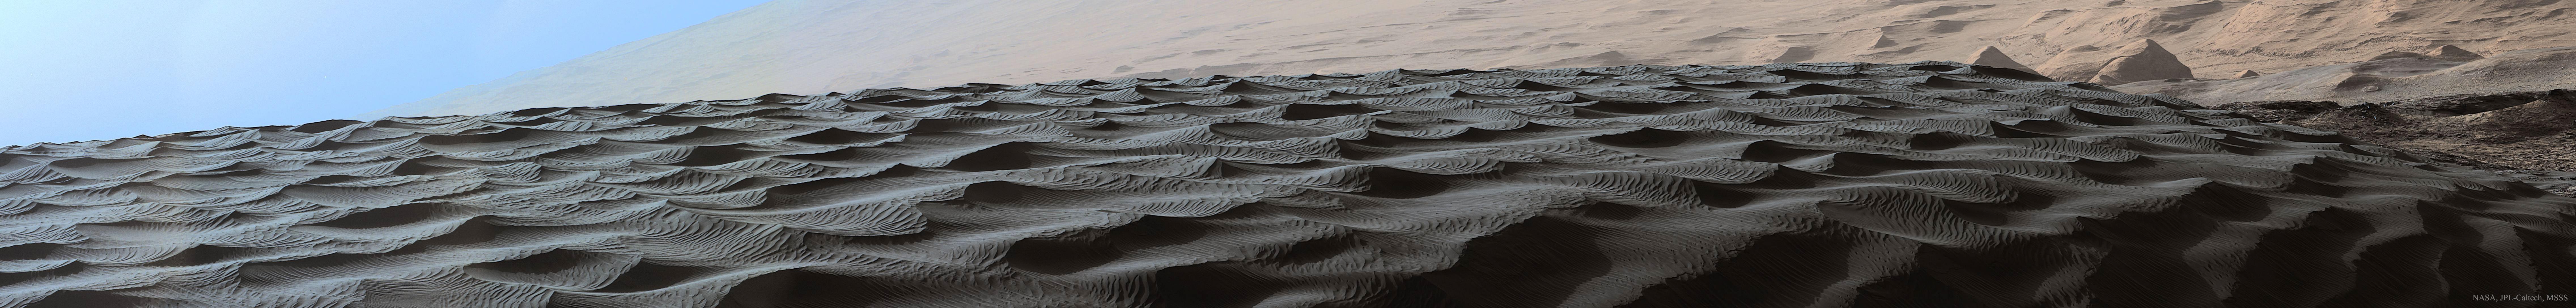 duny-mars